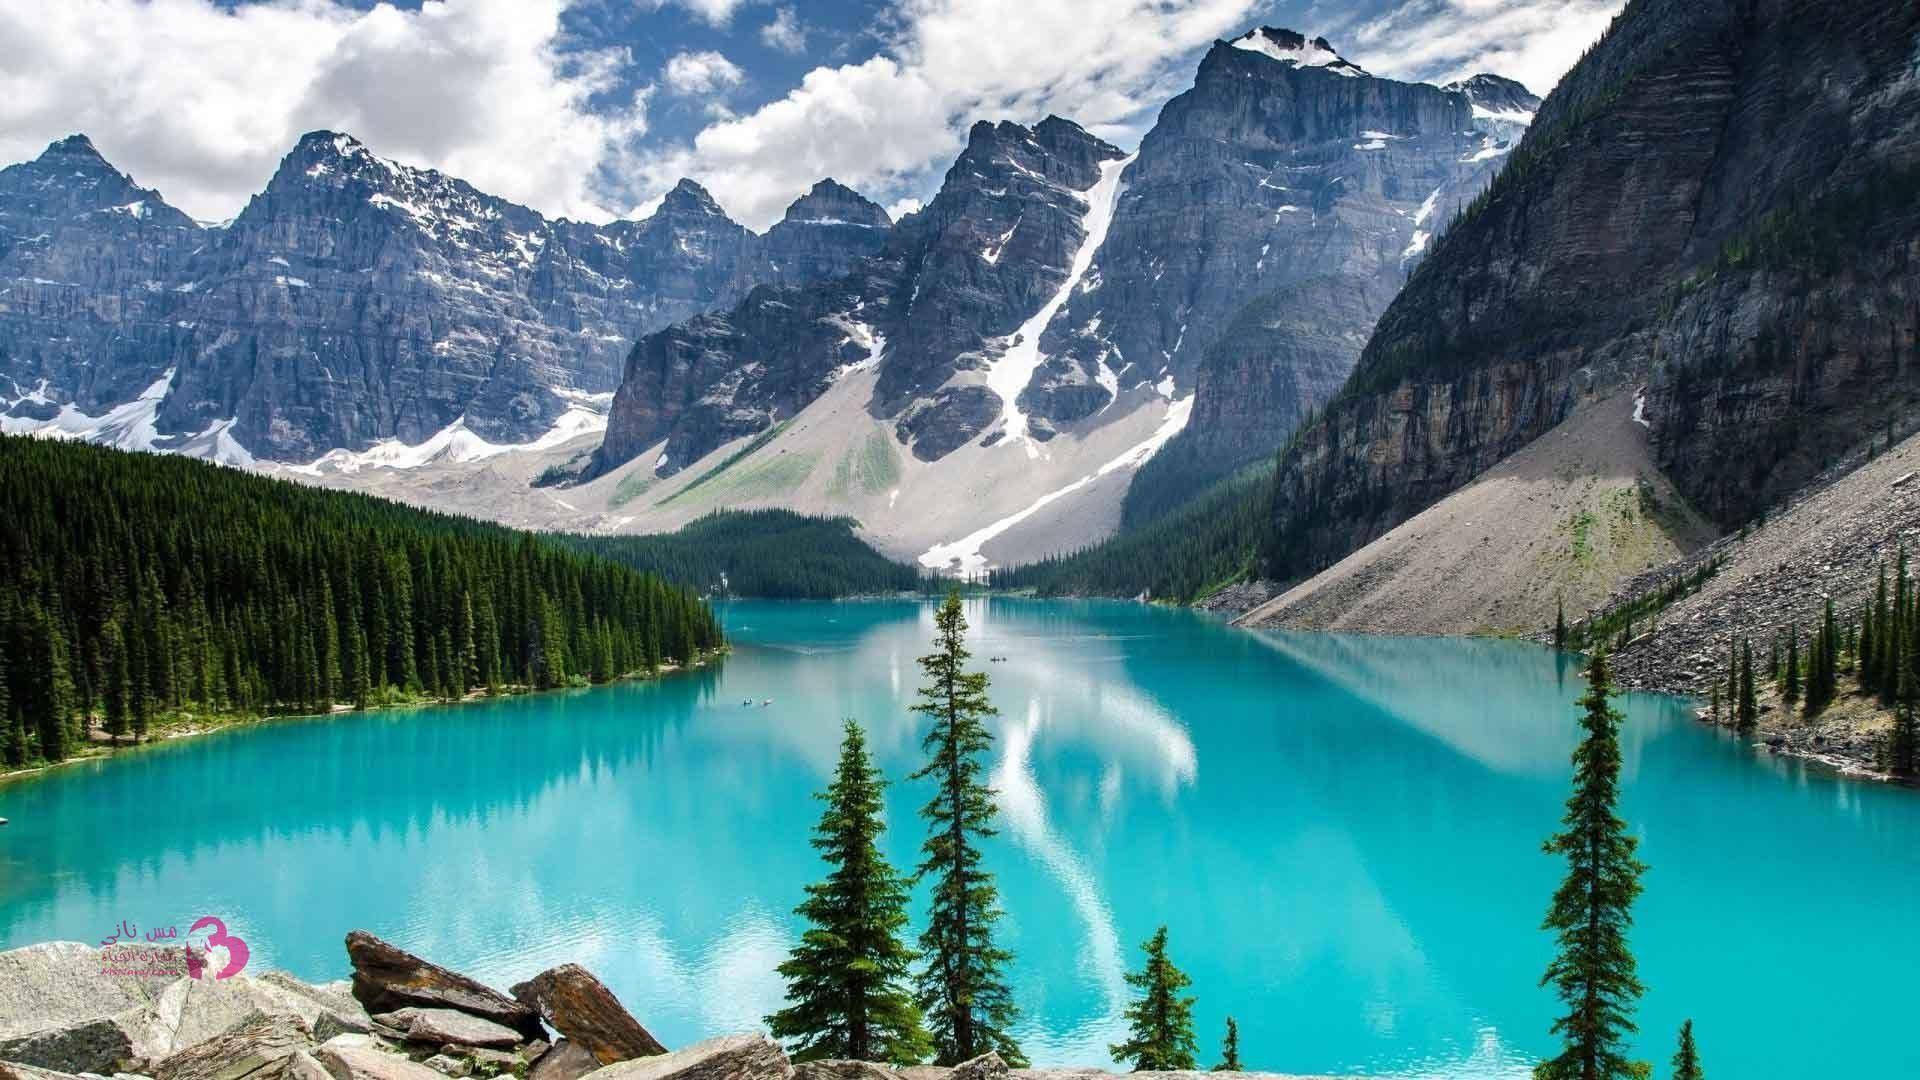 Rocky Mountain good background